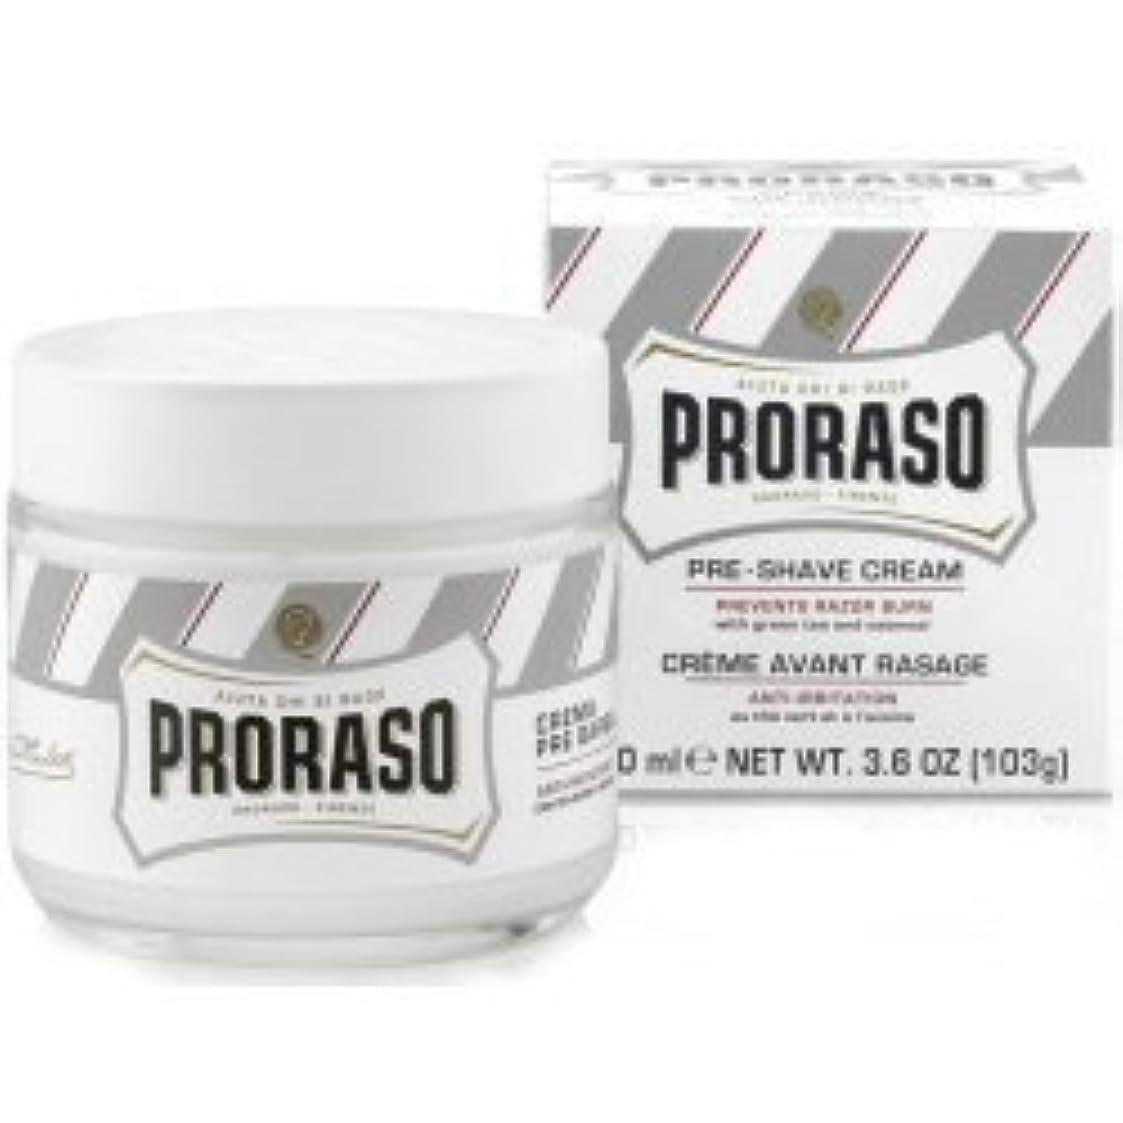 脱走運河手足Proraso Pre & Post Shave Cream Sensitive Skin 100ml by Proraso [並行輸入品]